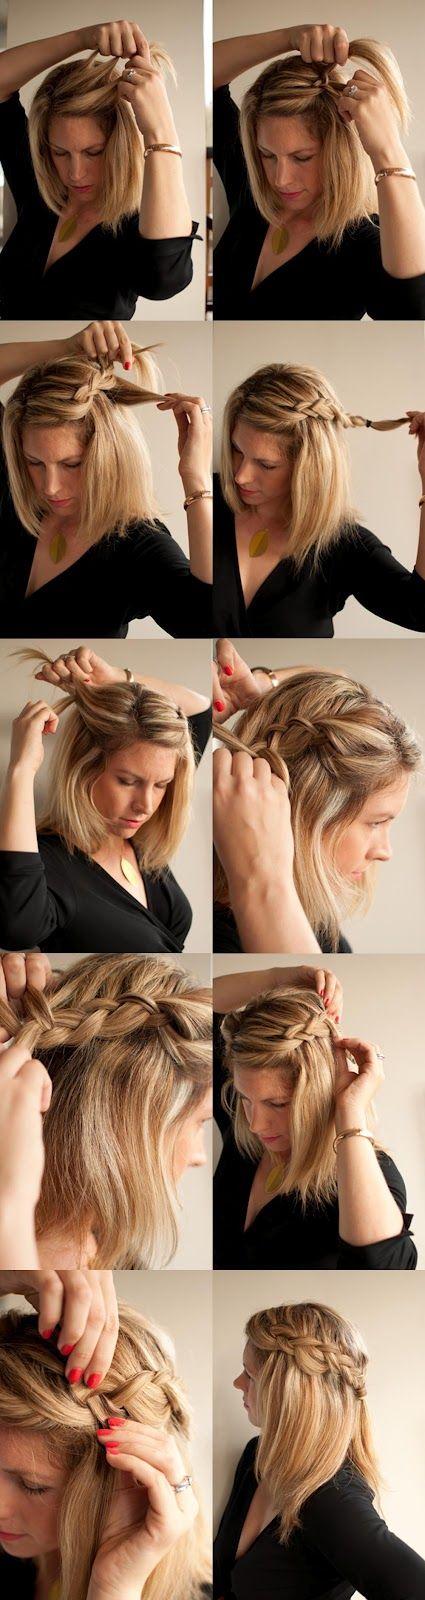 Make Easy and simple side braid | hairstyles tutorial